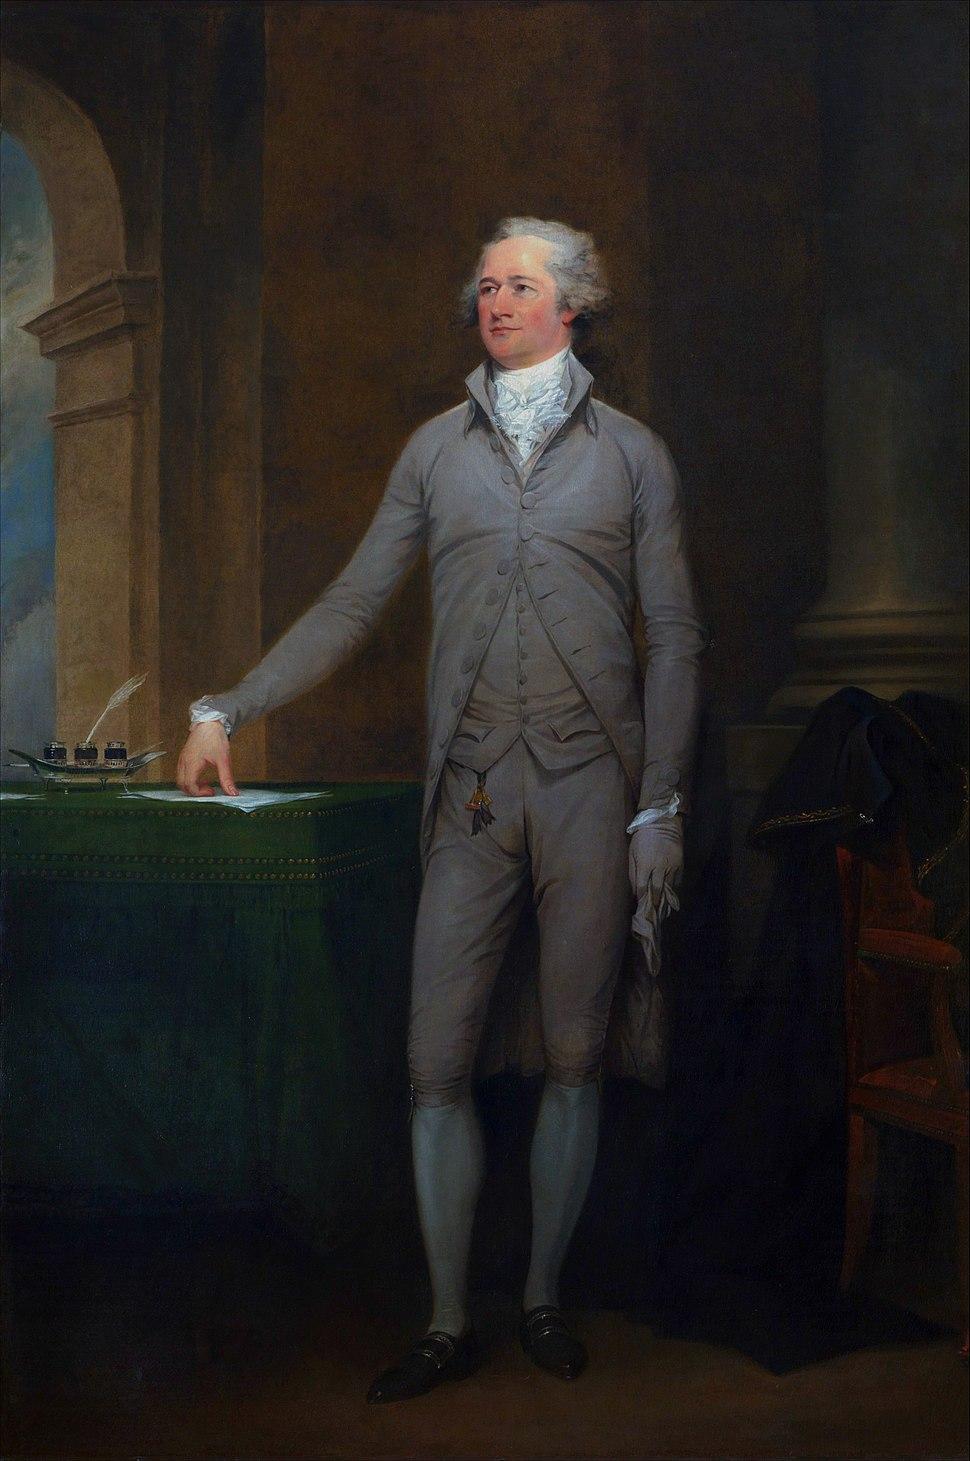 Hamilton Trumbull 1792-retouch